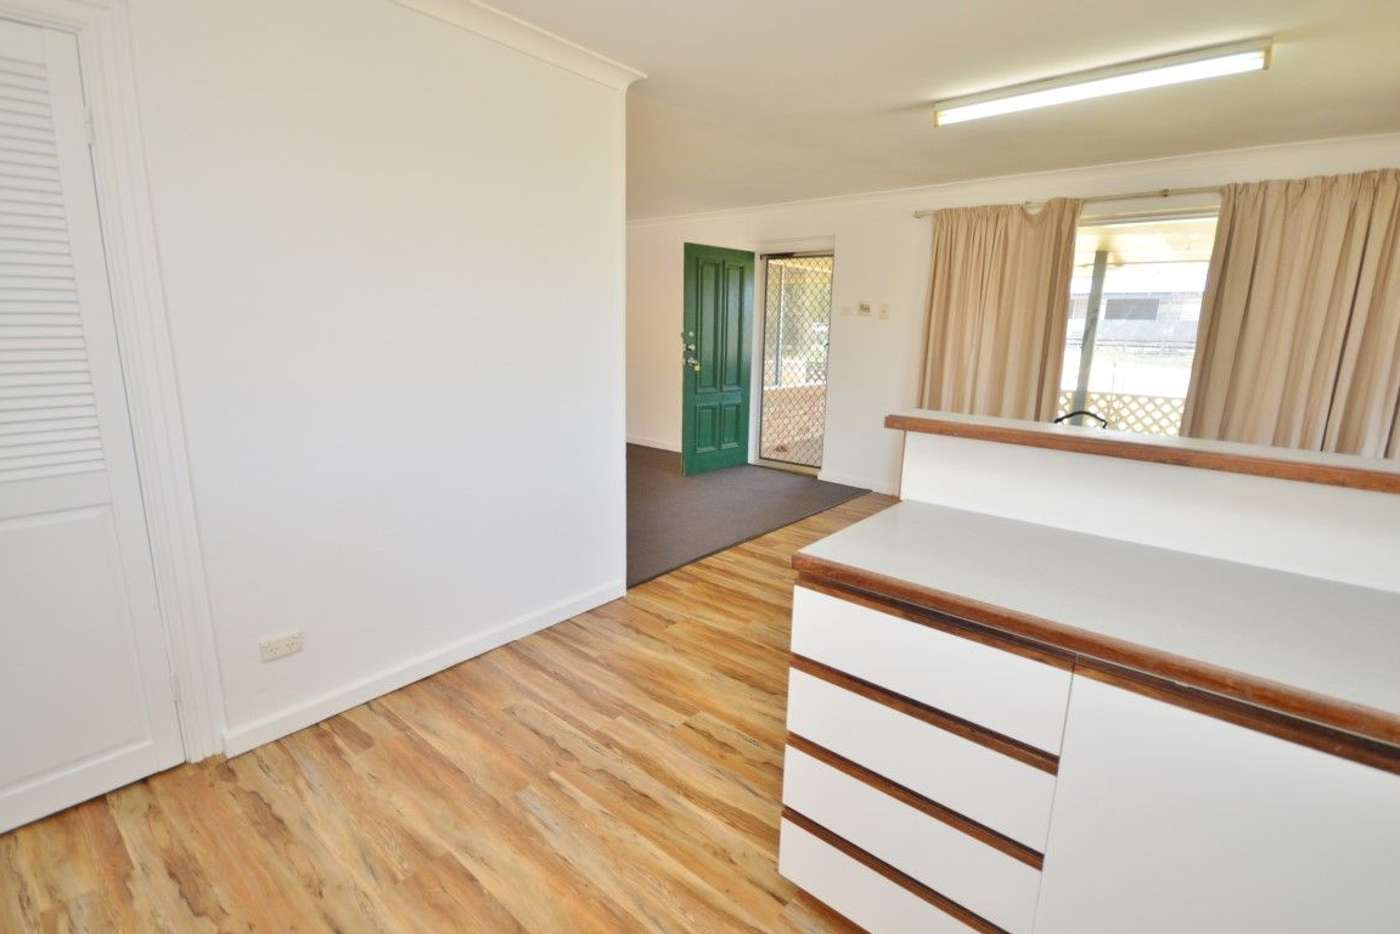 Sixth view of Homely house listing, 15 Mallard Street, Kalbarri WA 6536